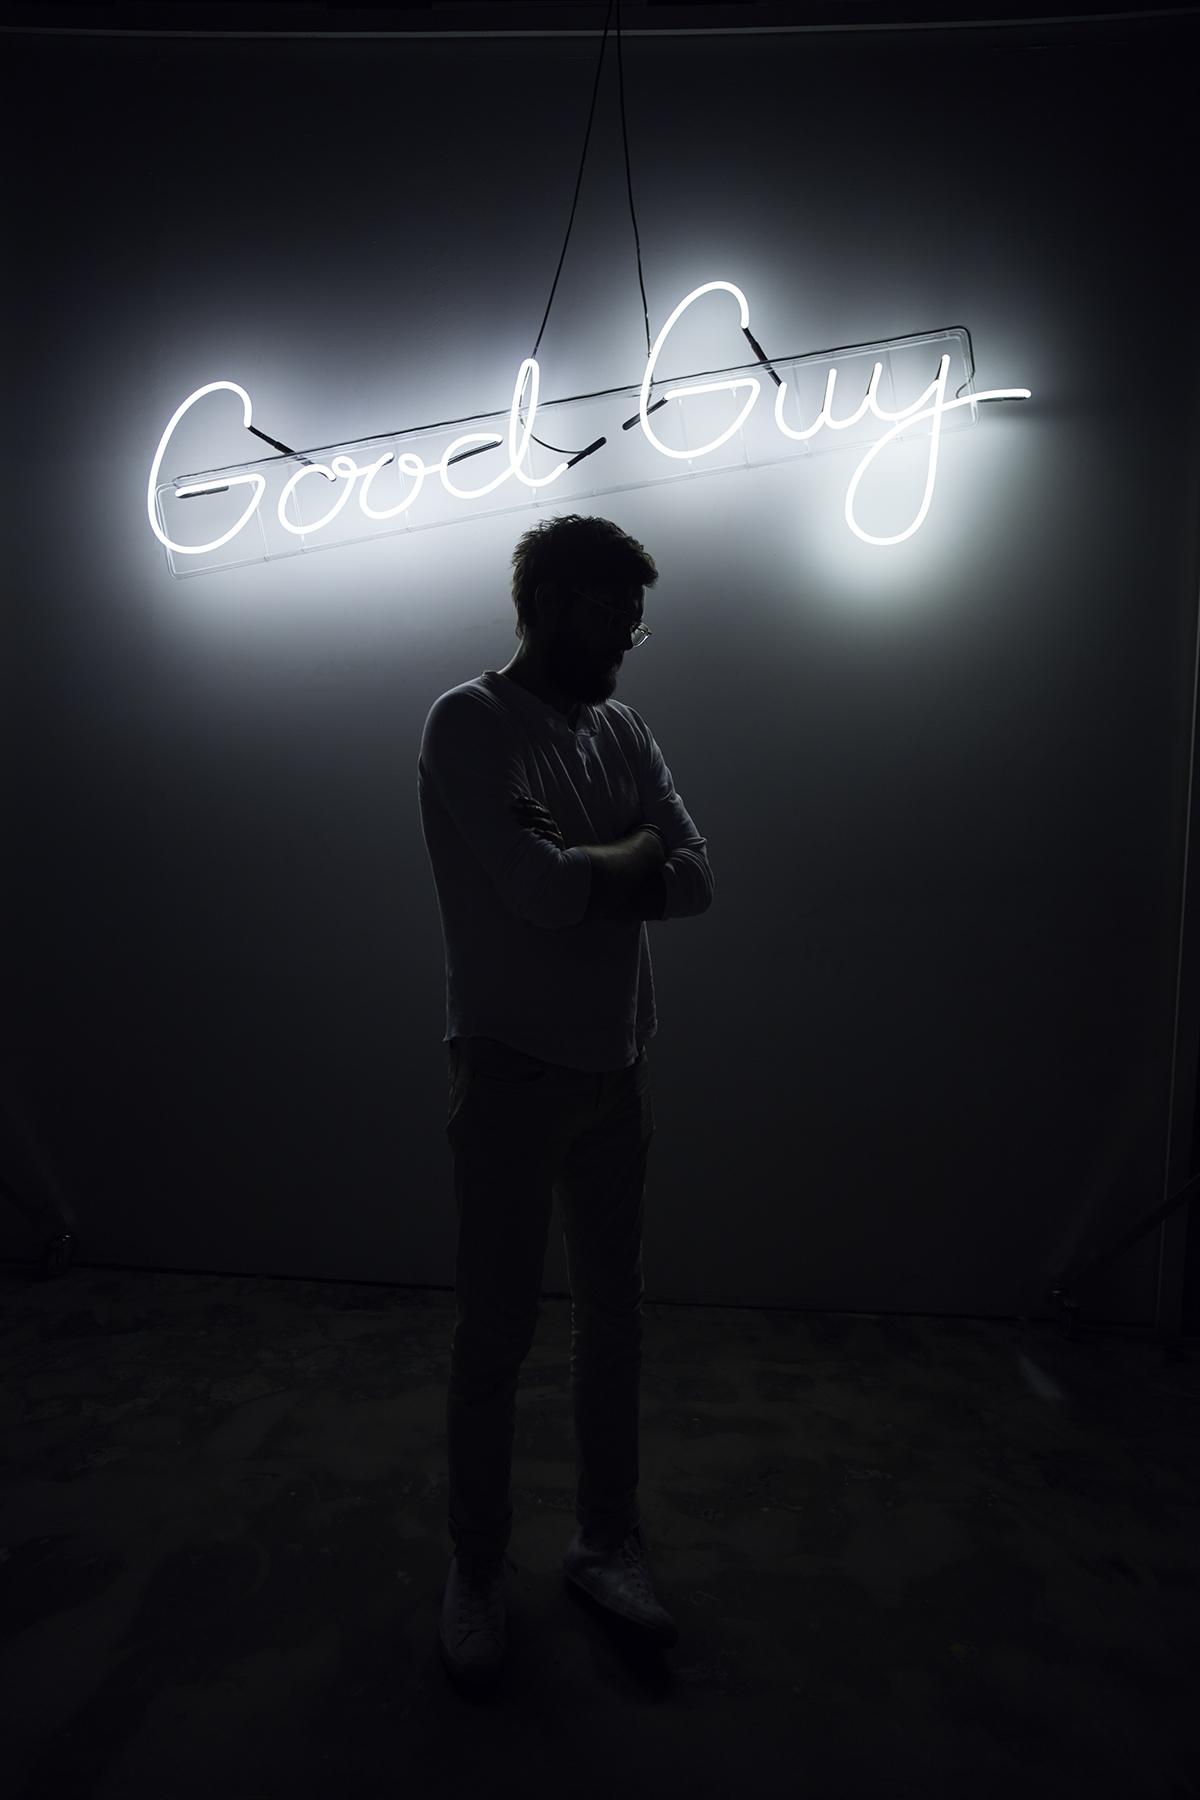 Nick Thune - Good Guy LP